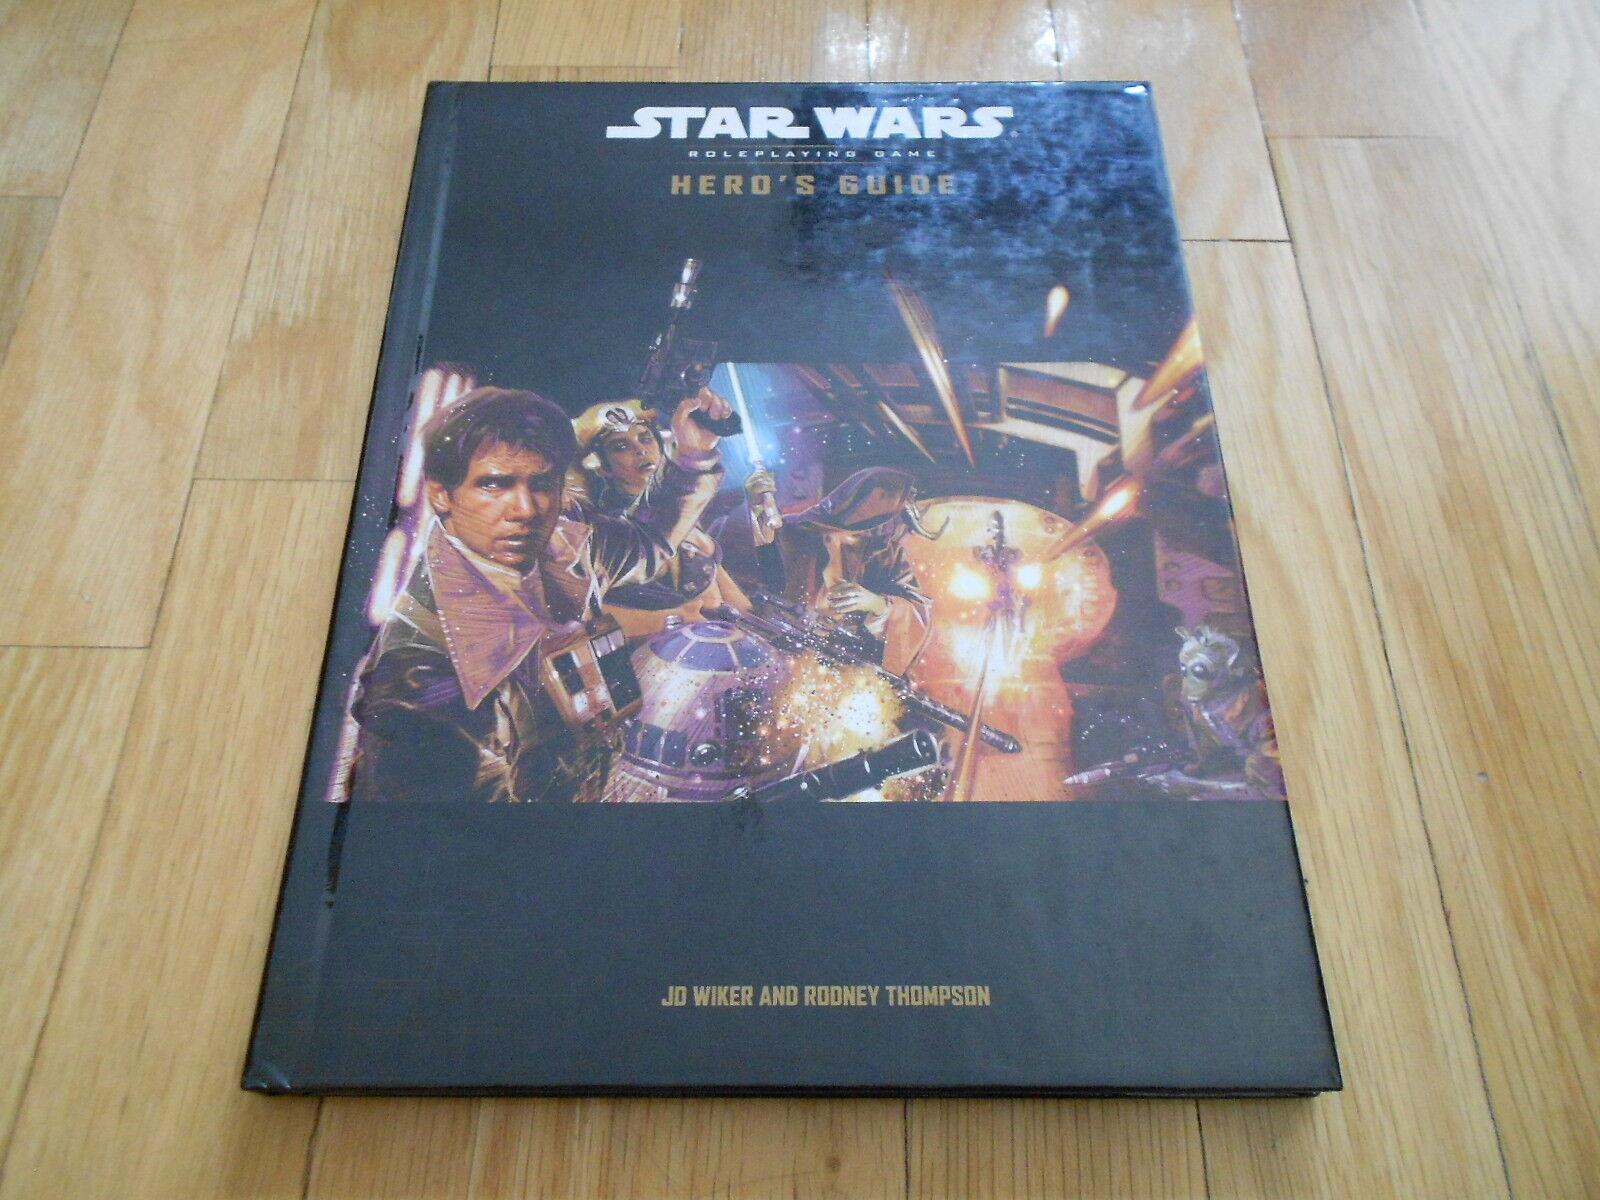 star wars  - helden ´ s guide - el rol - 176670000 - rpg d20 wotc